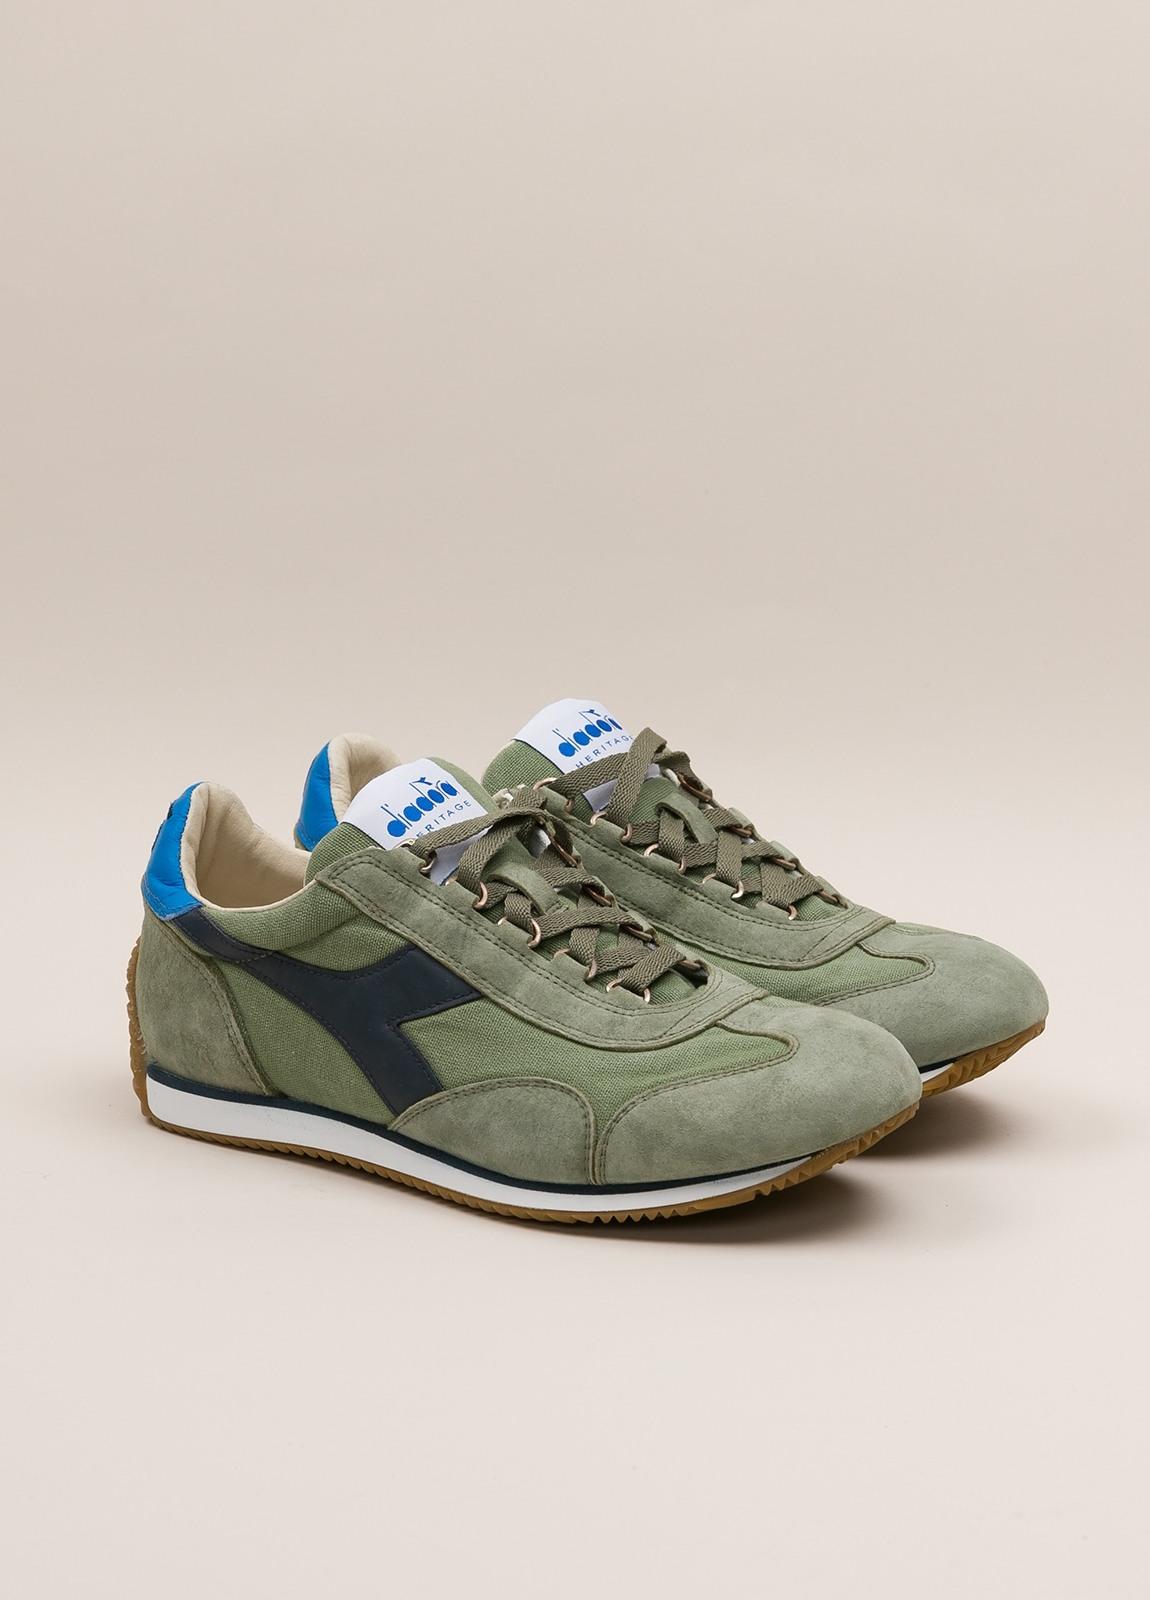 Sneakers DIADORA color verde - Ítem2